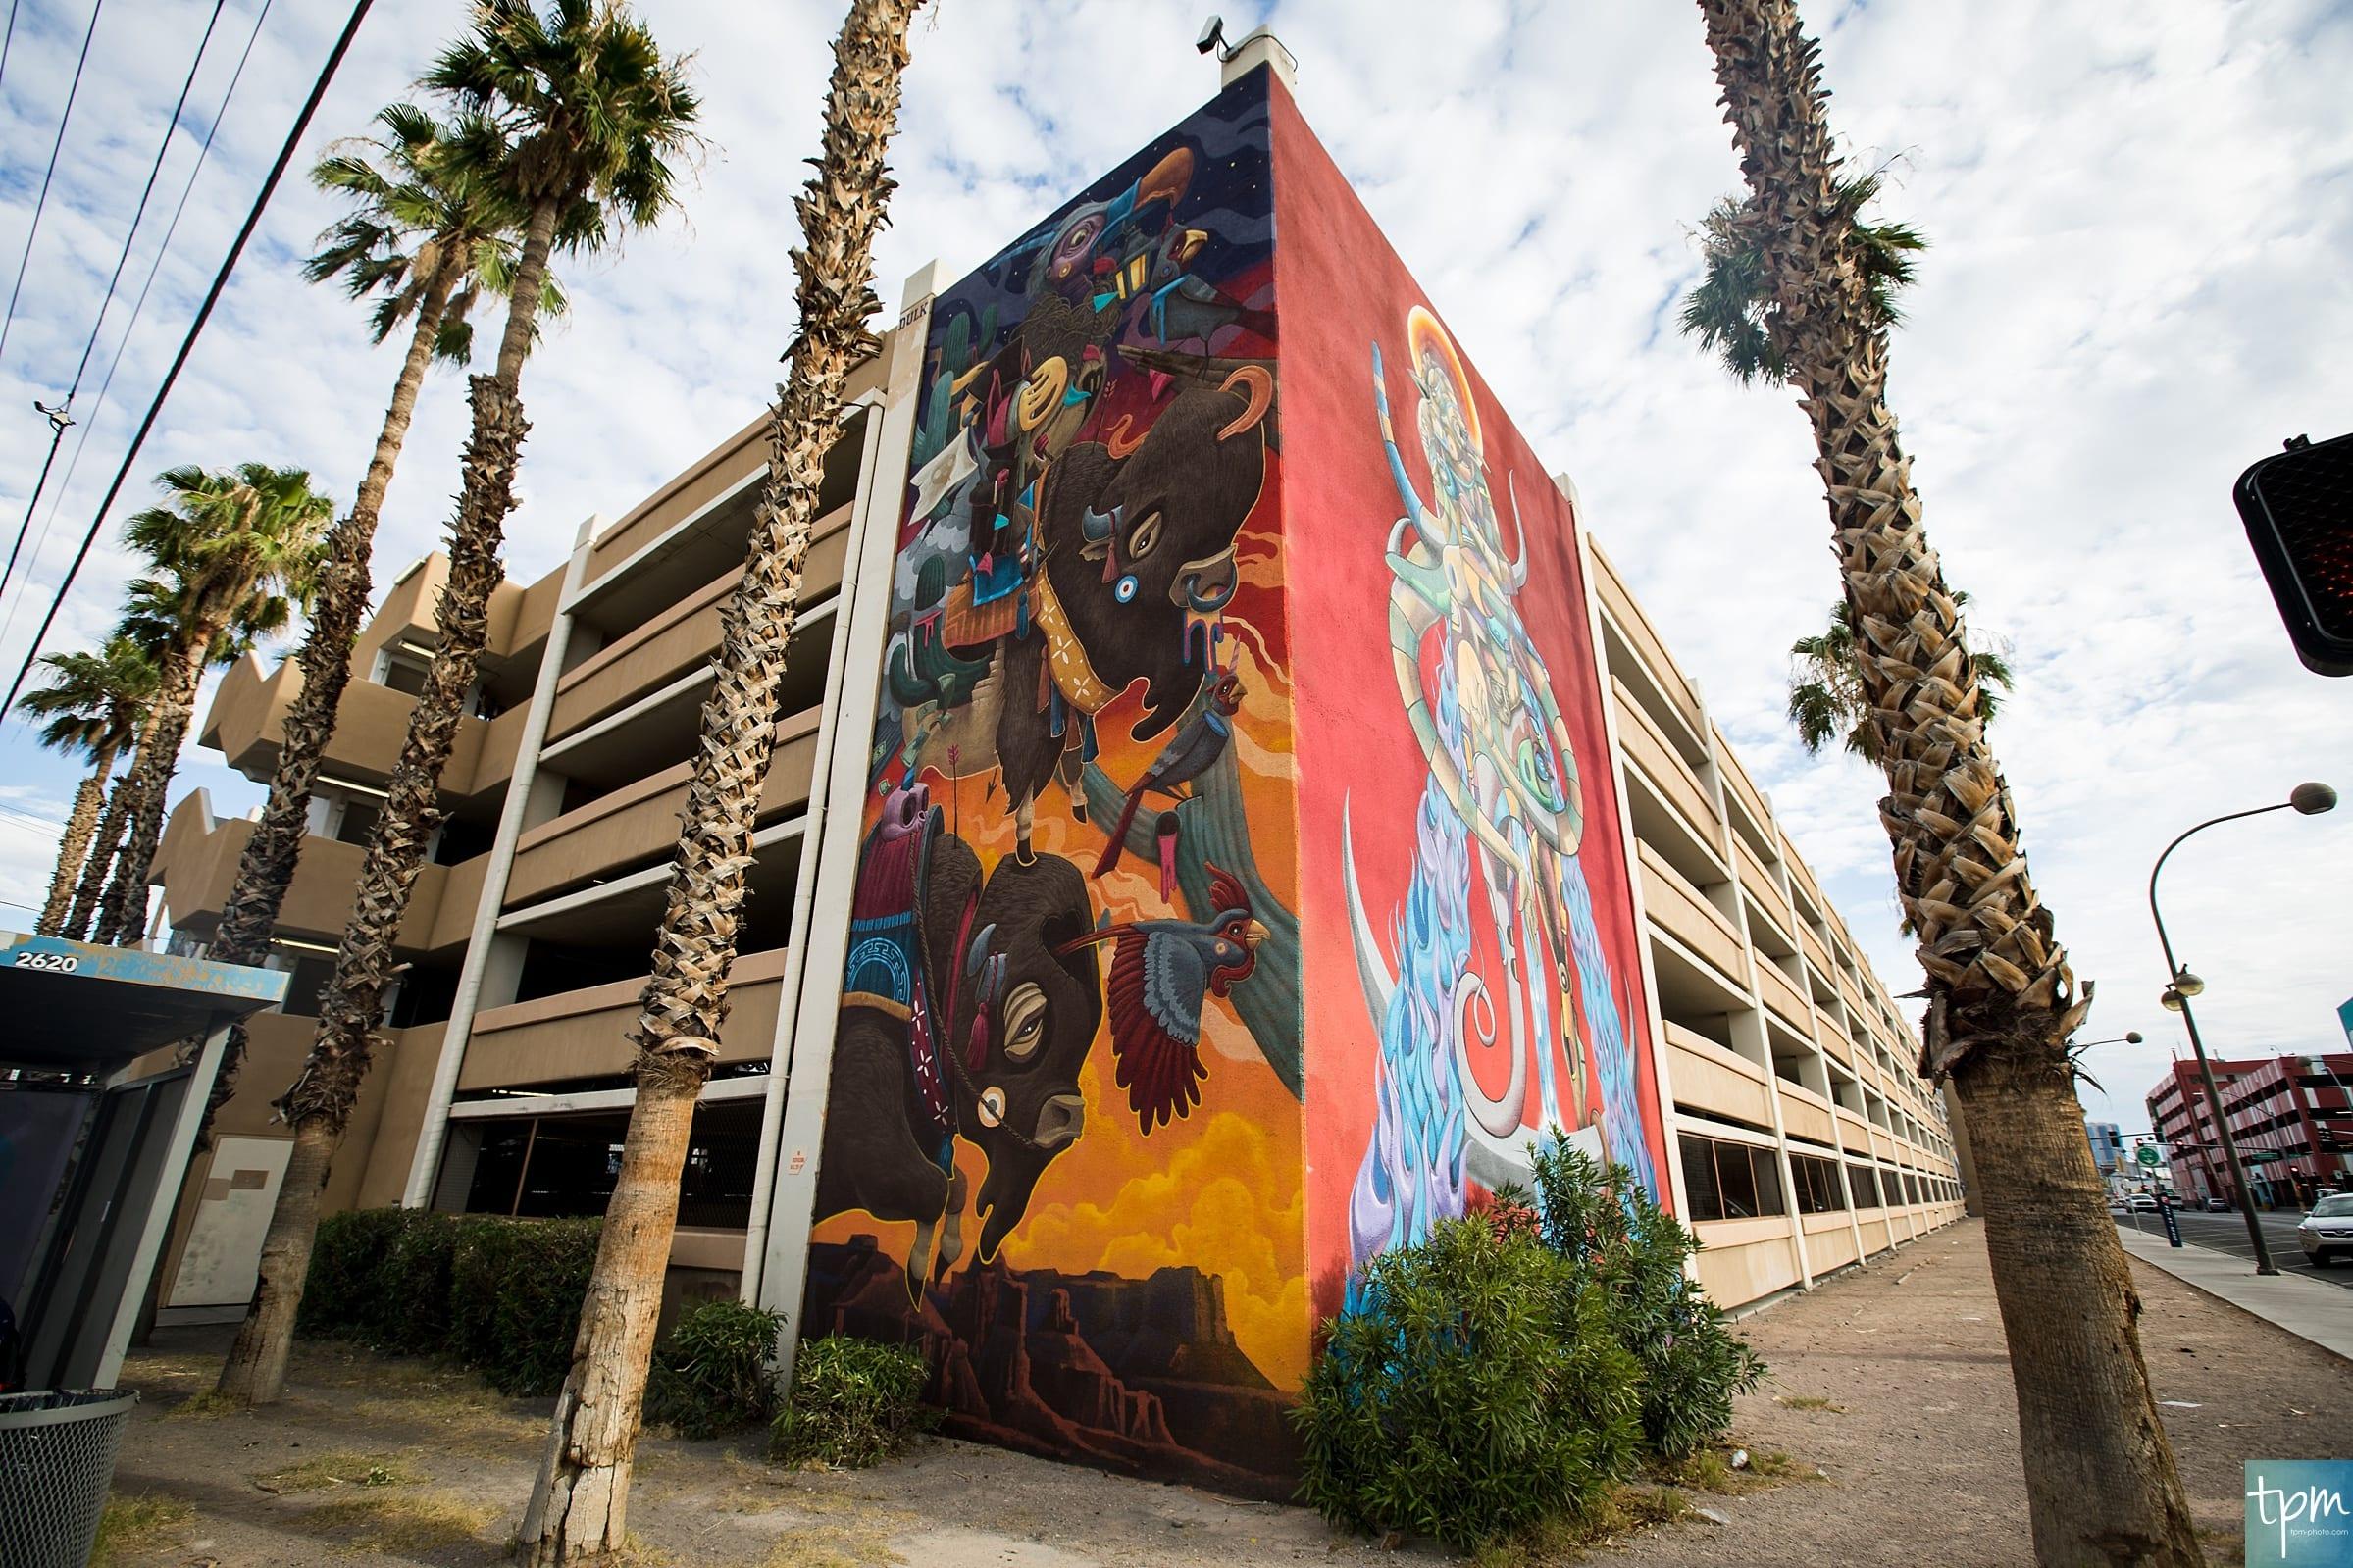 Dulk, TPM, 7th Street Mural, Taylored Photo Memories, Las Vegas Murals